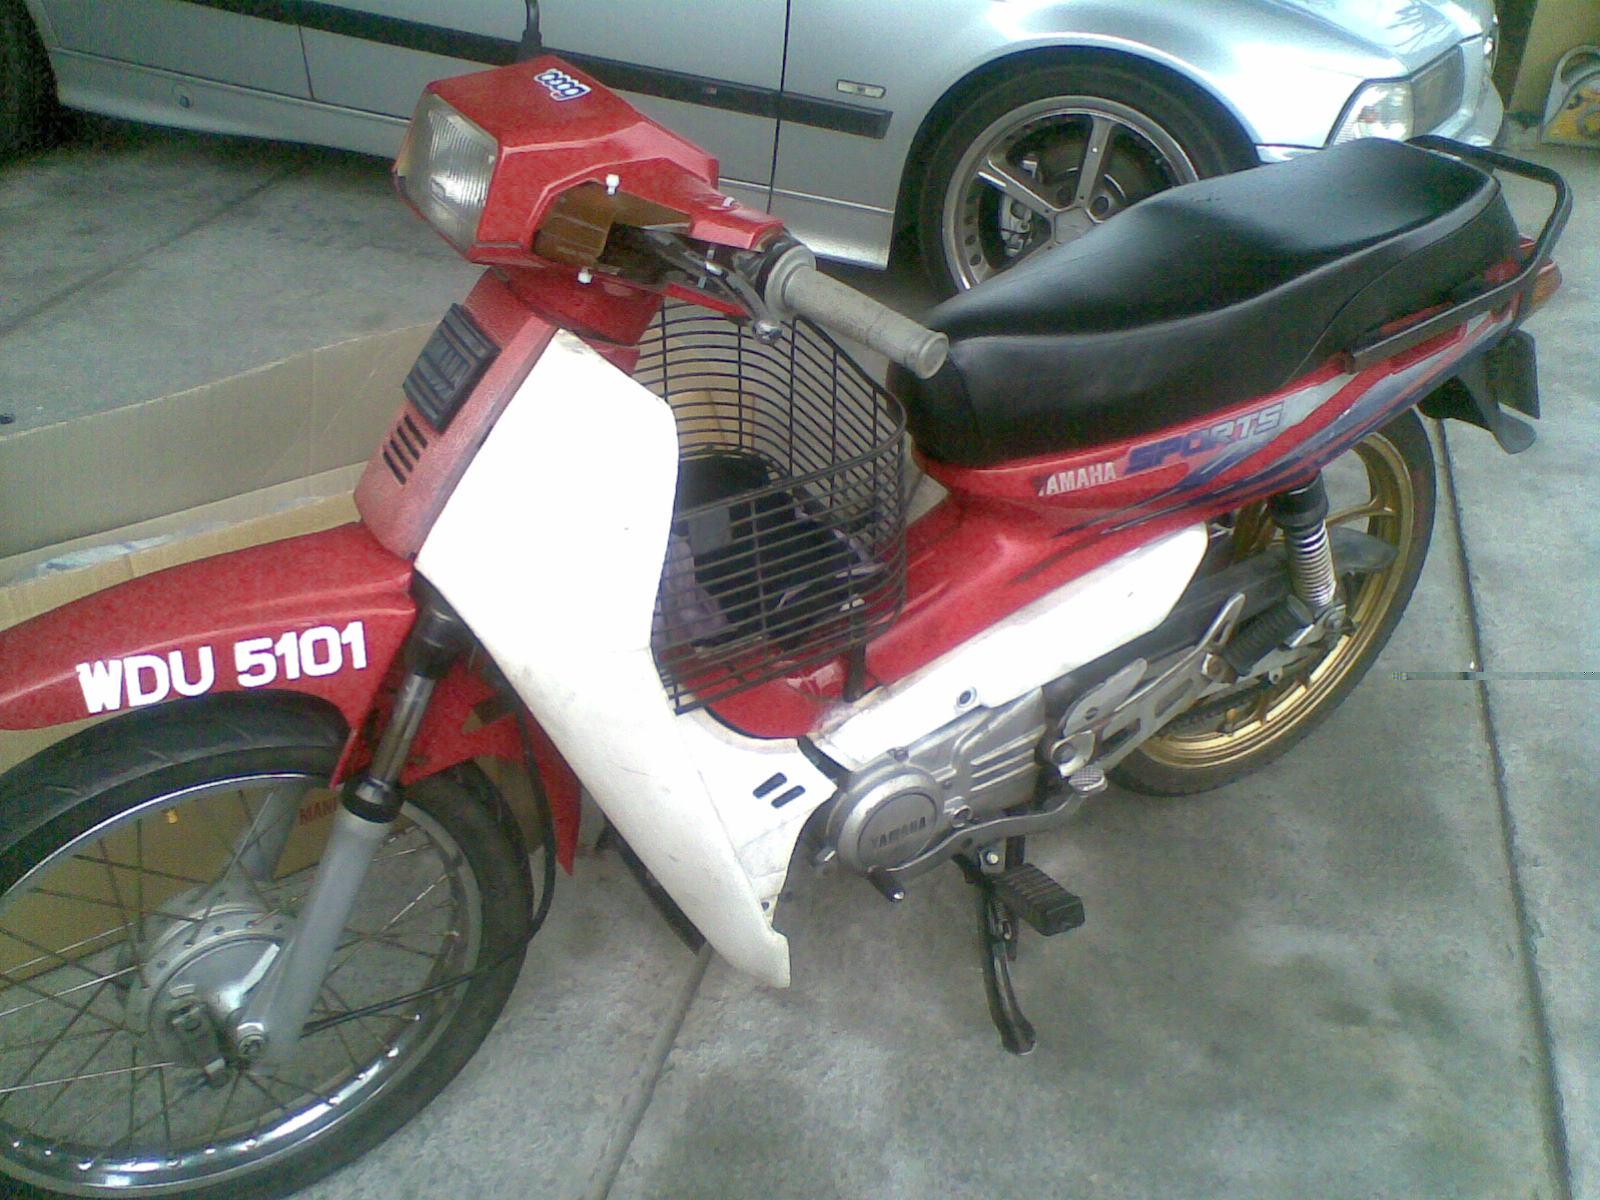 Download Kumpulan 93 Gambar Motor Yamaha Sport 100 Terunik